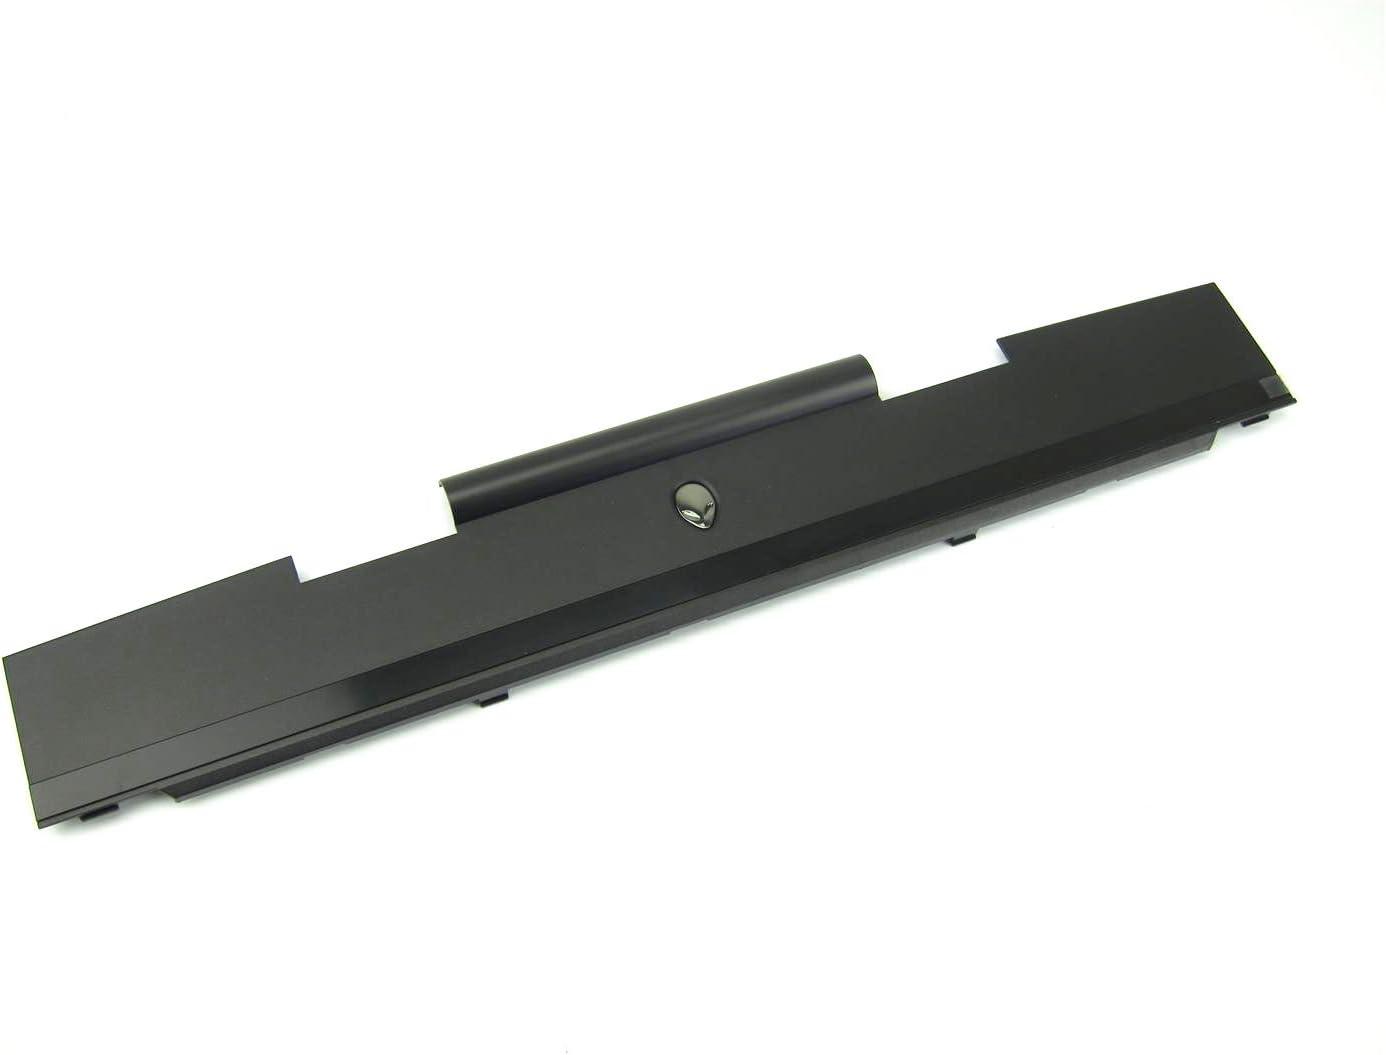 Alienware M15x Center Control Power Button Cover / Hinge Cover - 7R5VJ